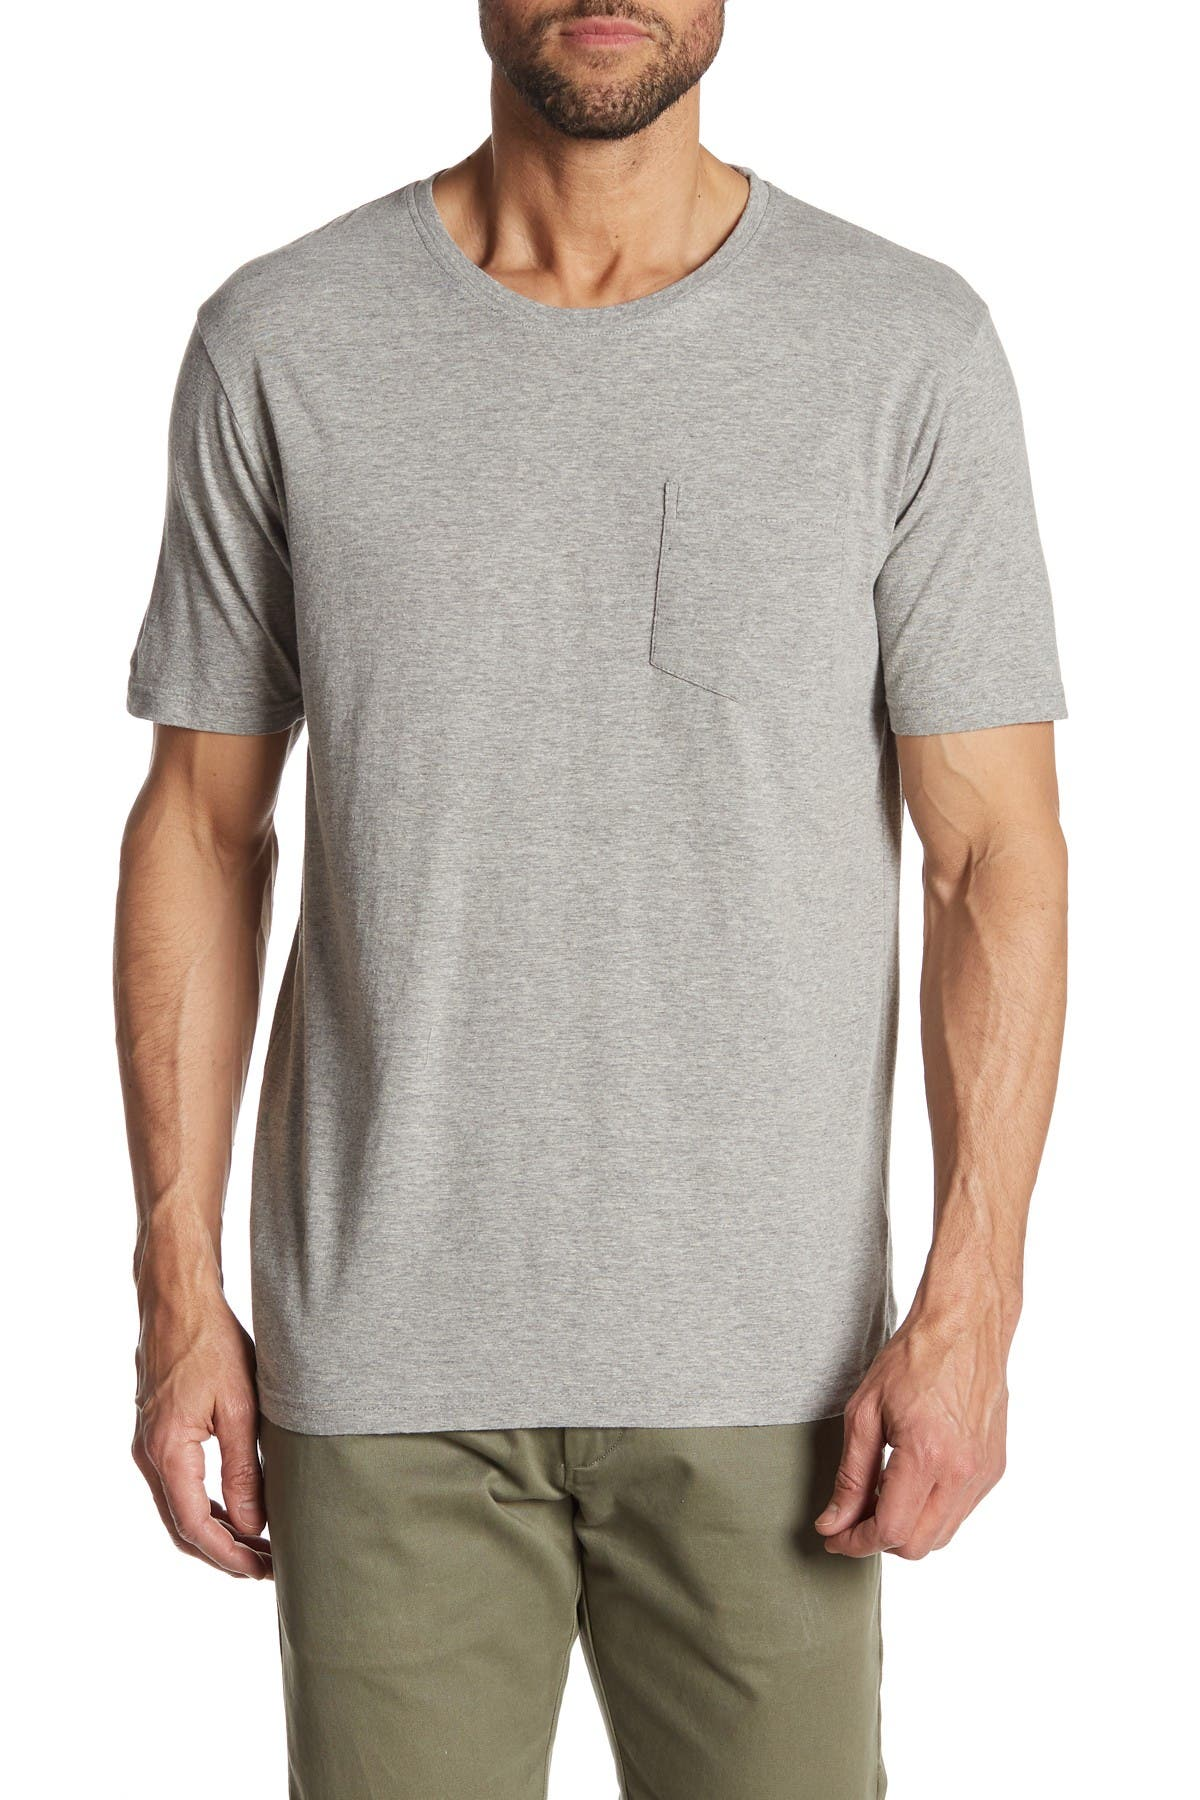 Image of COASTAORO Ventura Crew Neck T-Shirt